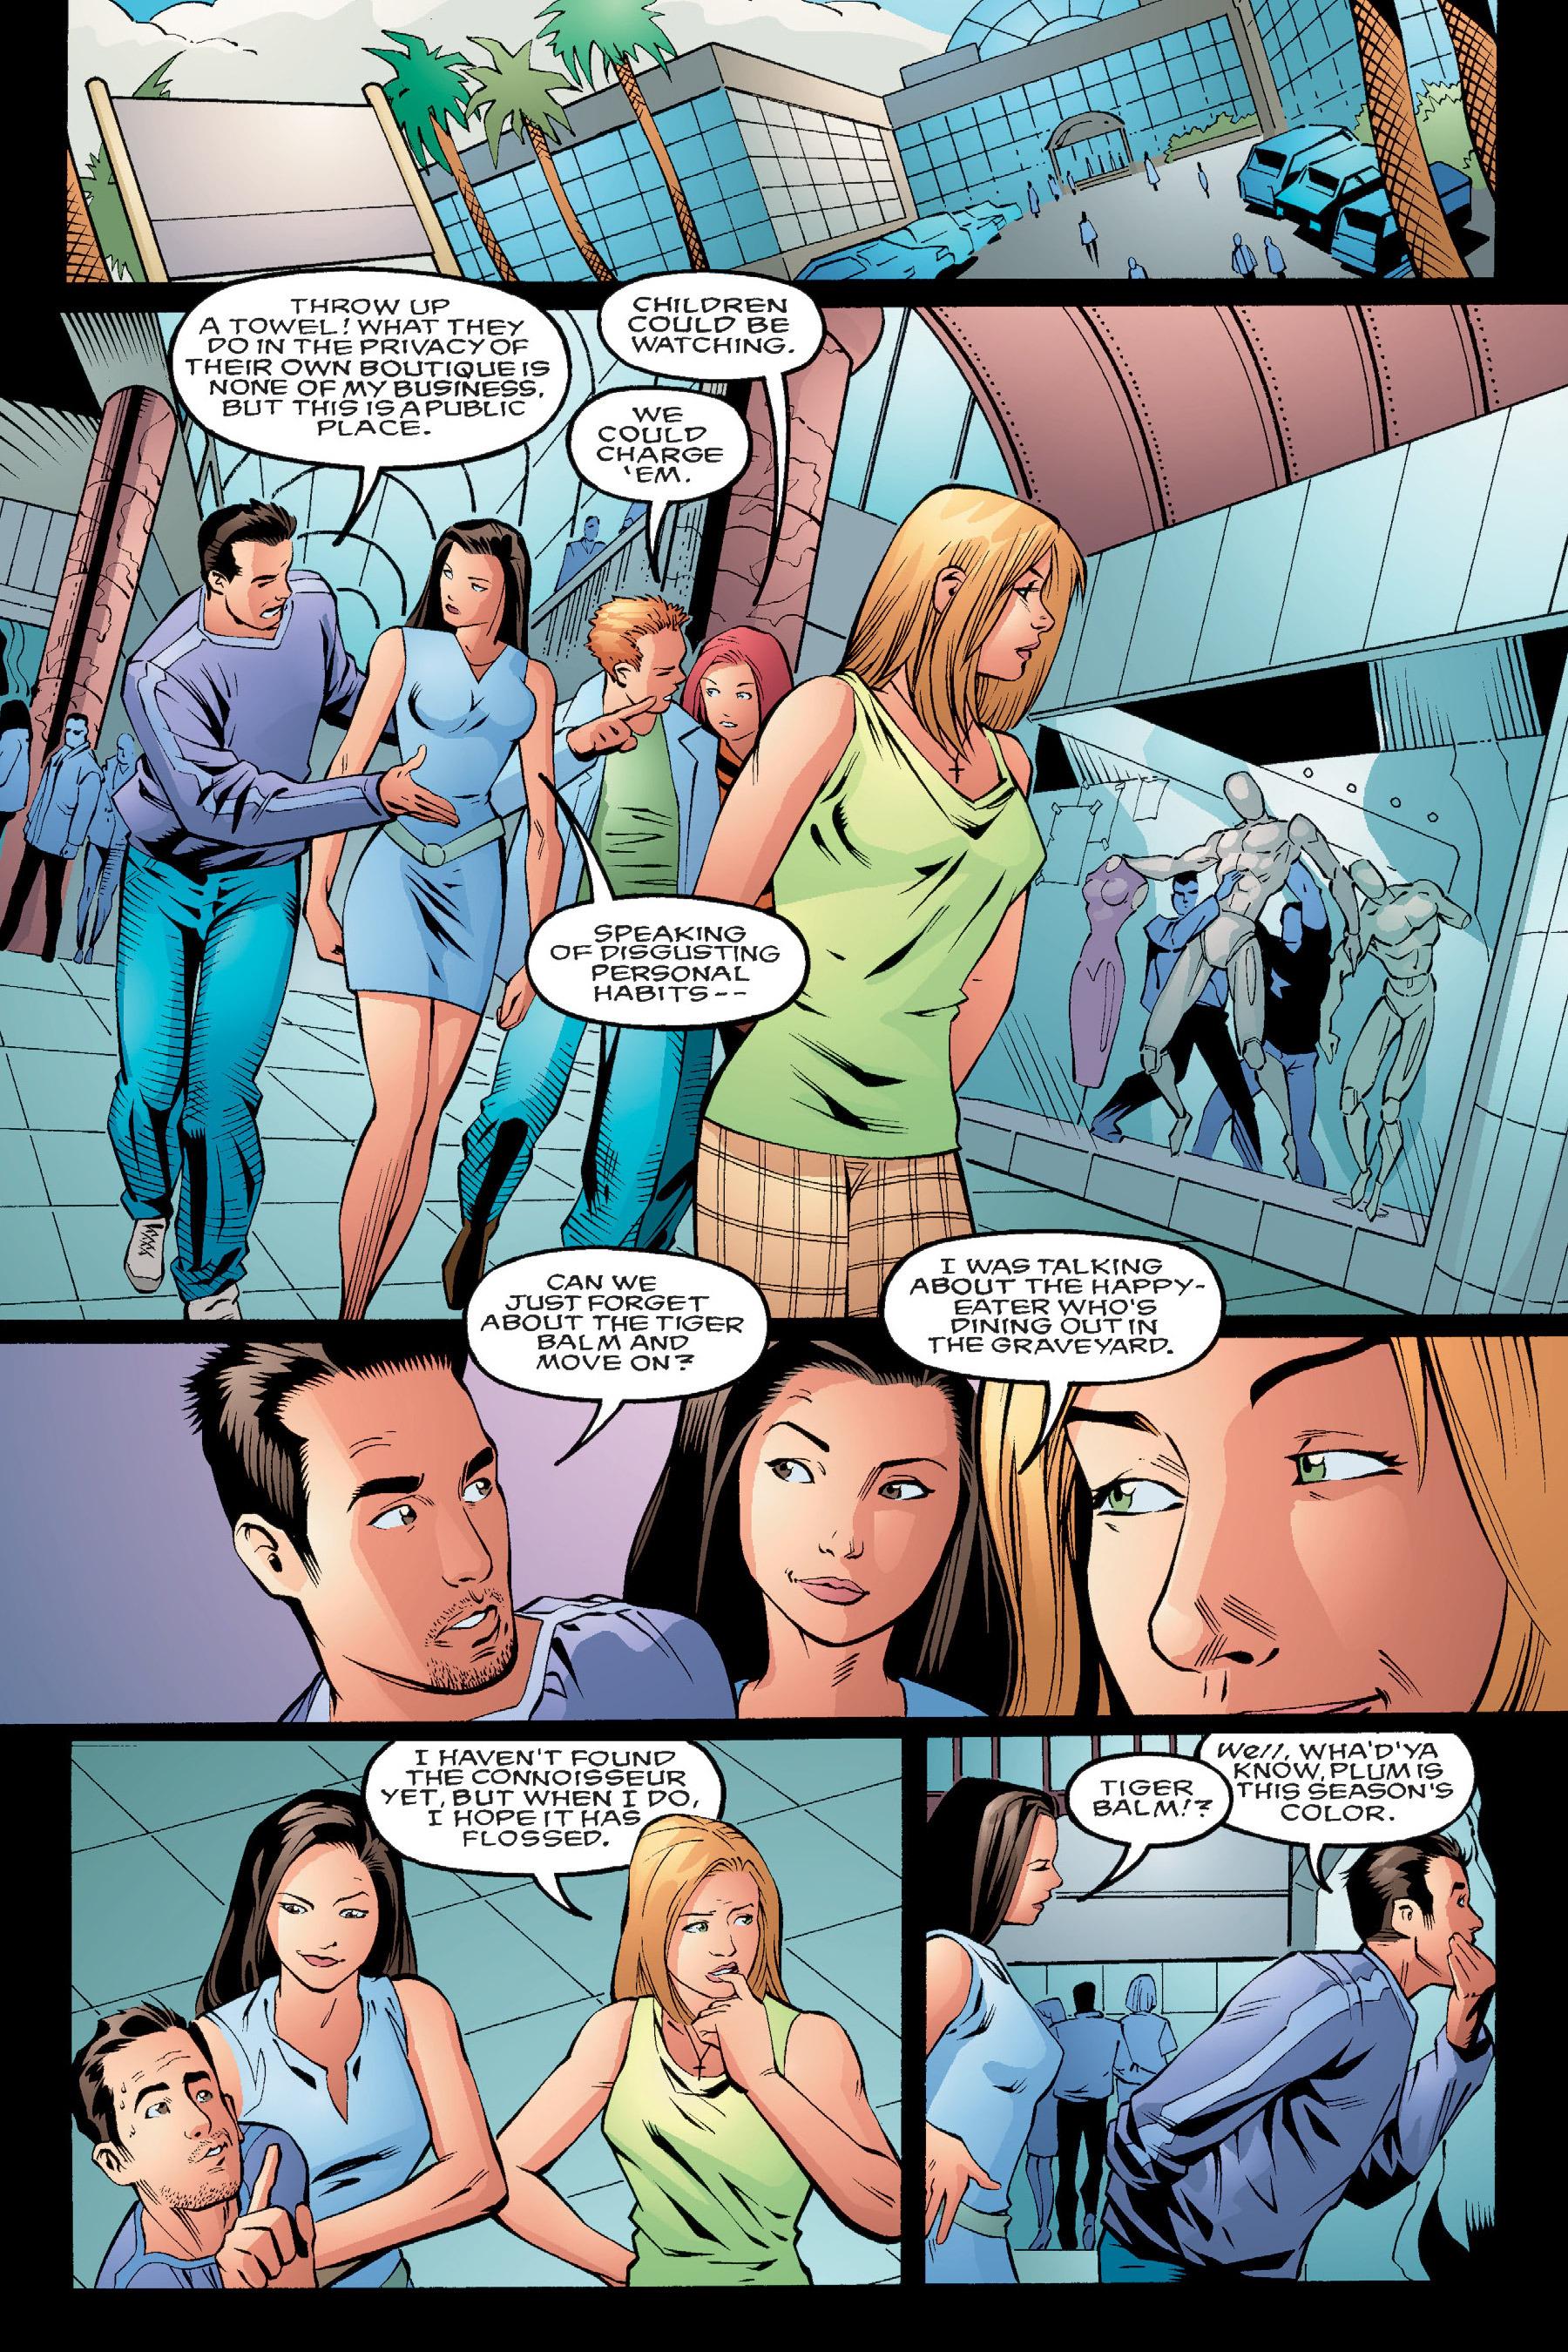 Read online Buffy the Vampire Slayer: Omnibus comic -  Issue # TPB 4 - 22